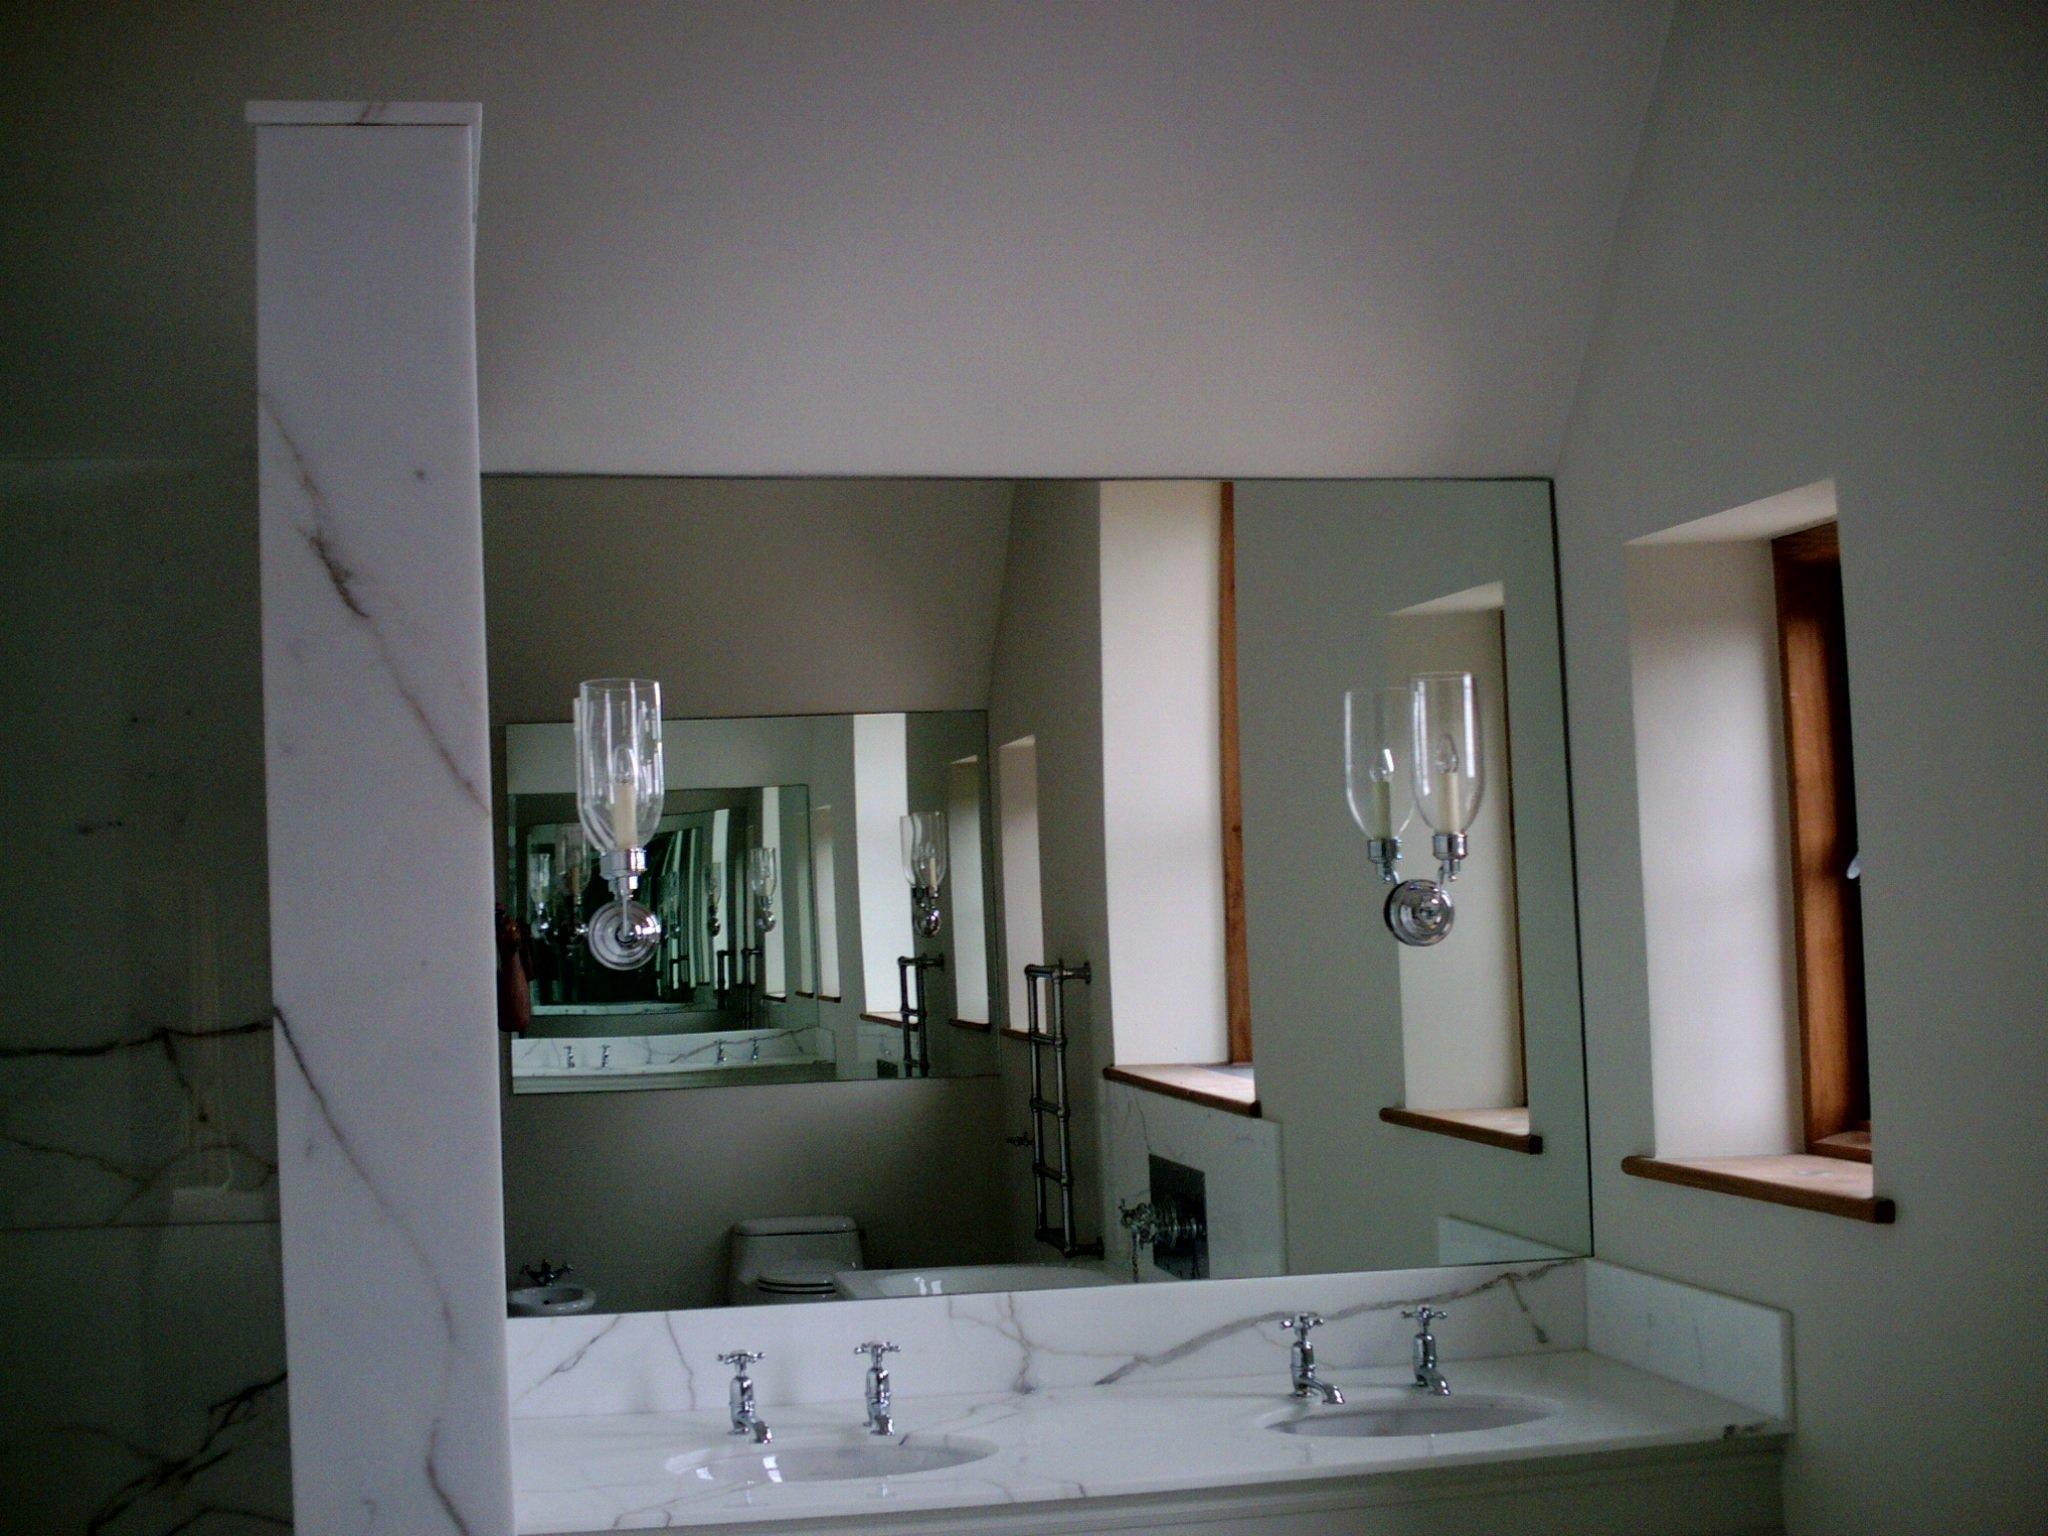 Mirror fitting